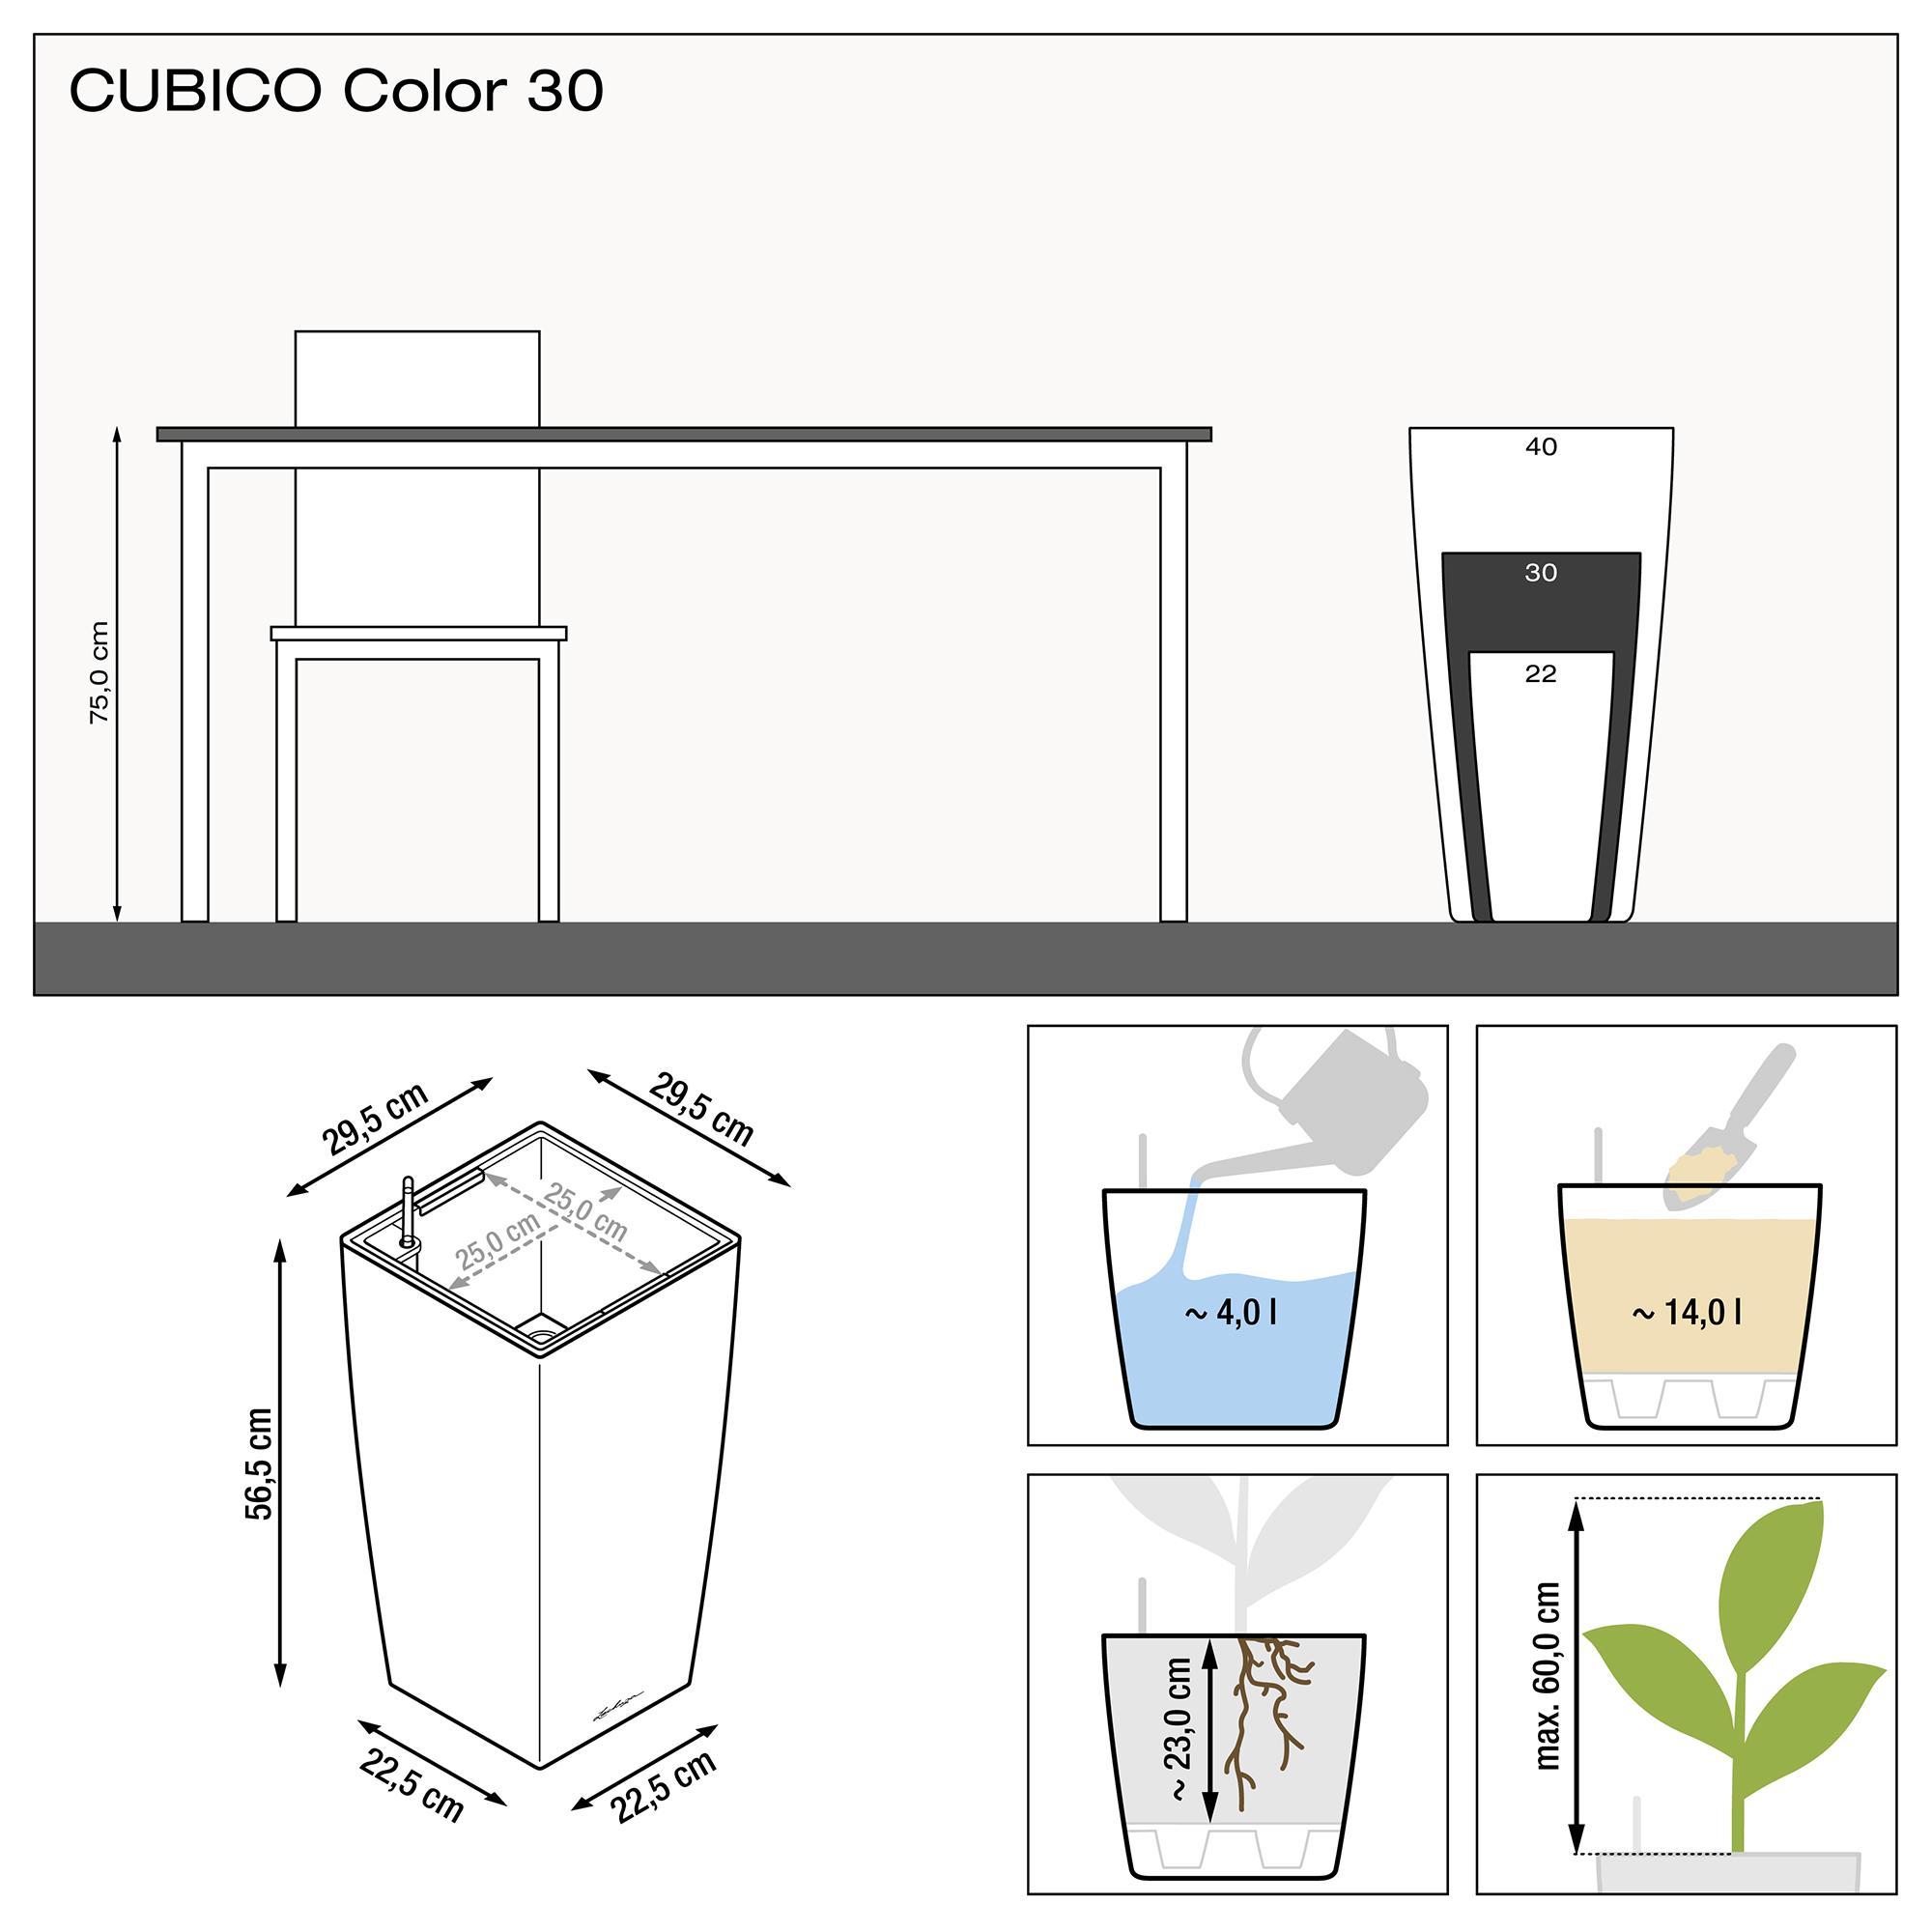 CUBICO Color 30 nutmeg - Image 3